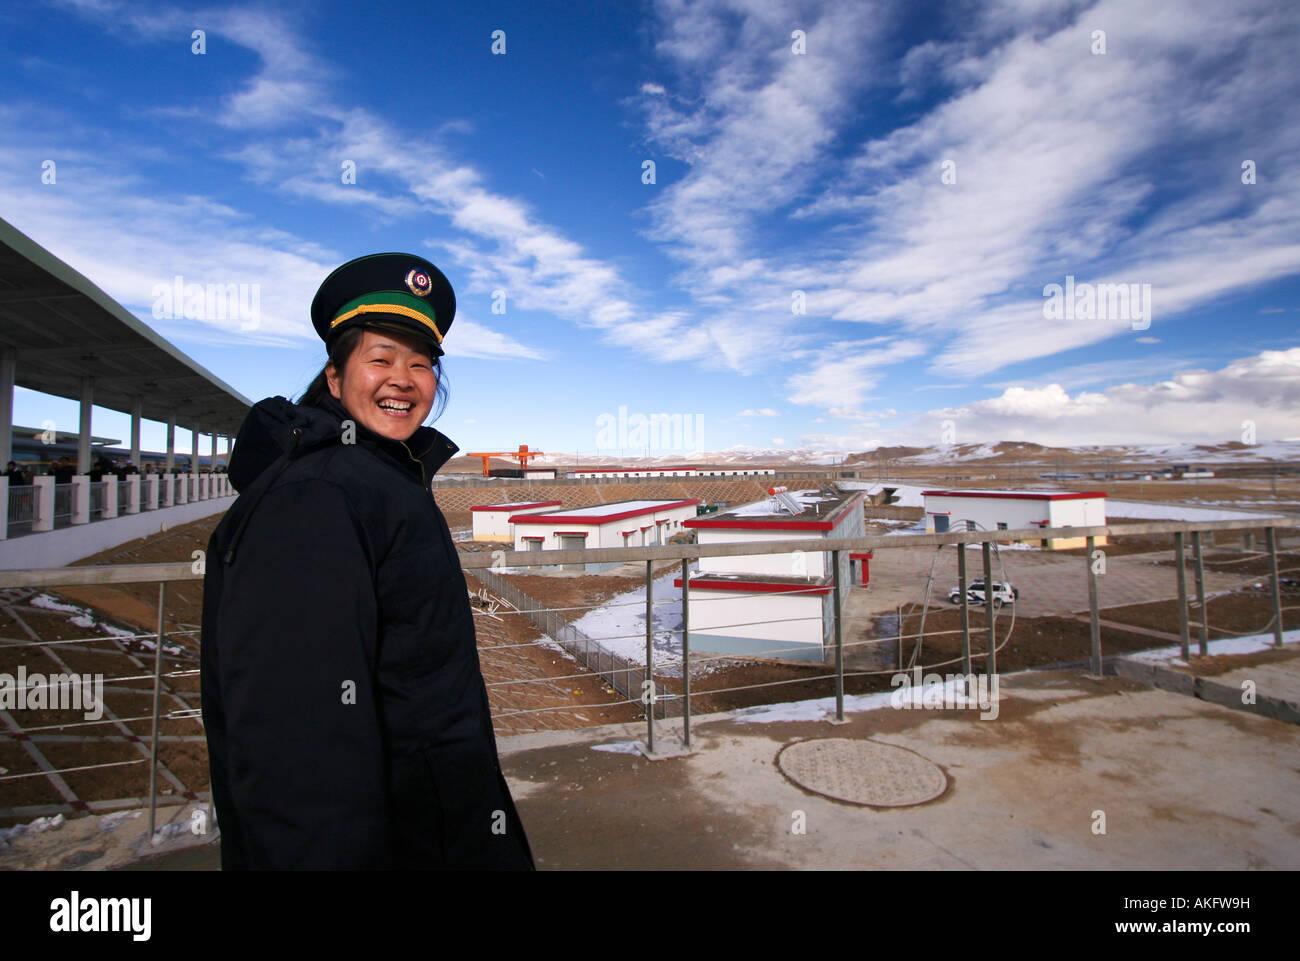 Railway s female worker from the Tibet Qinghai Railway s Tangula Express. - Stock Image